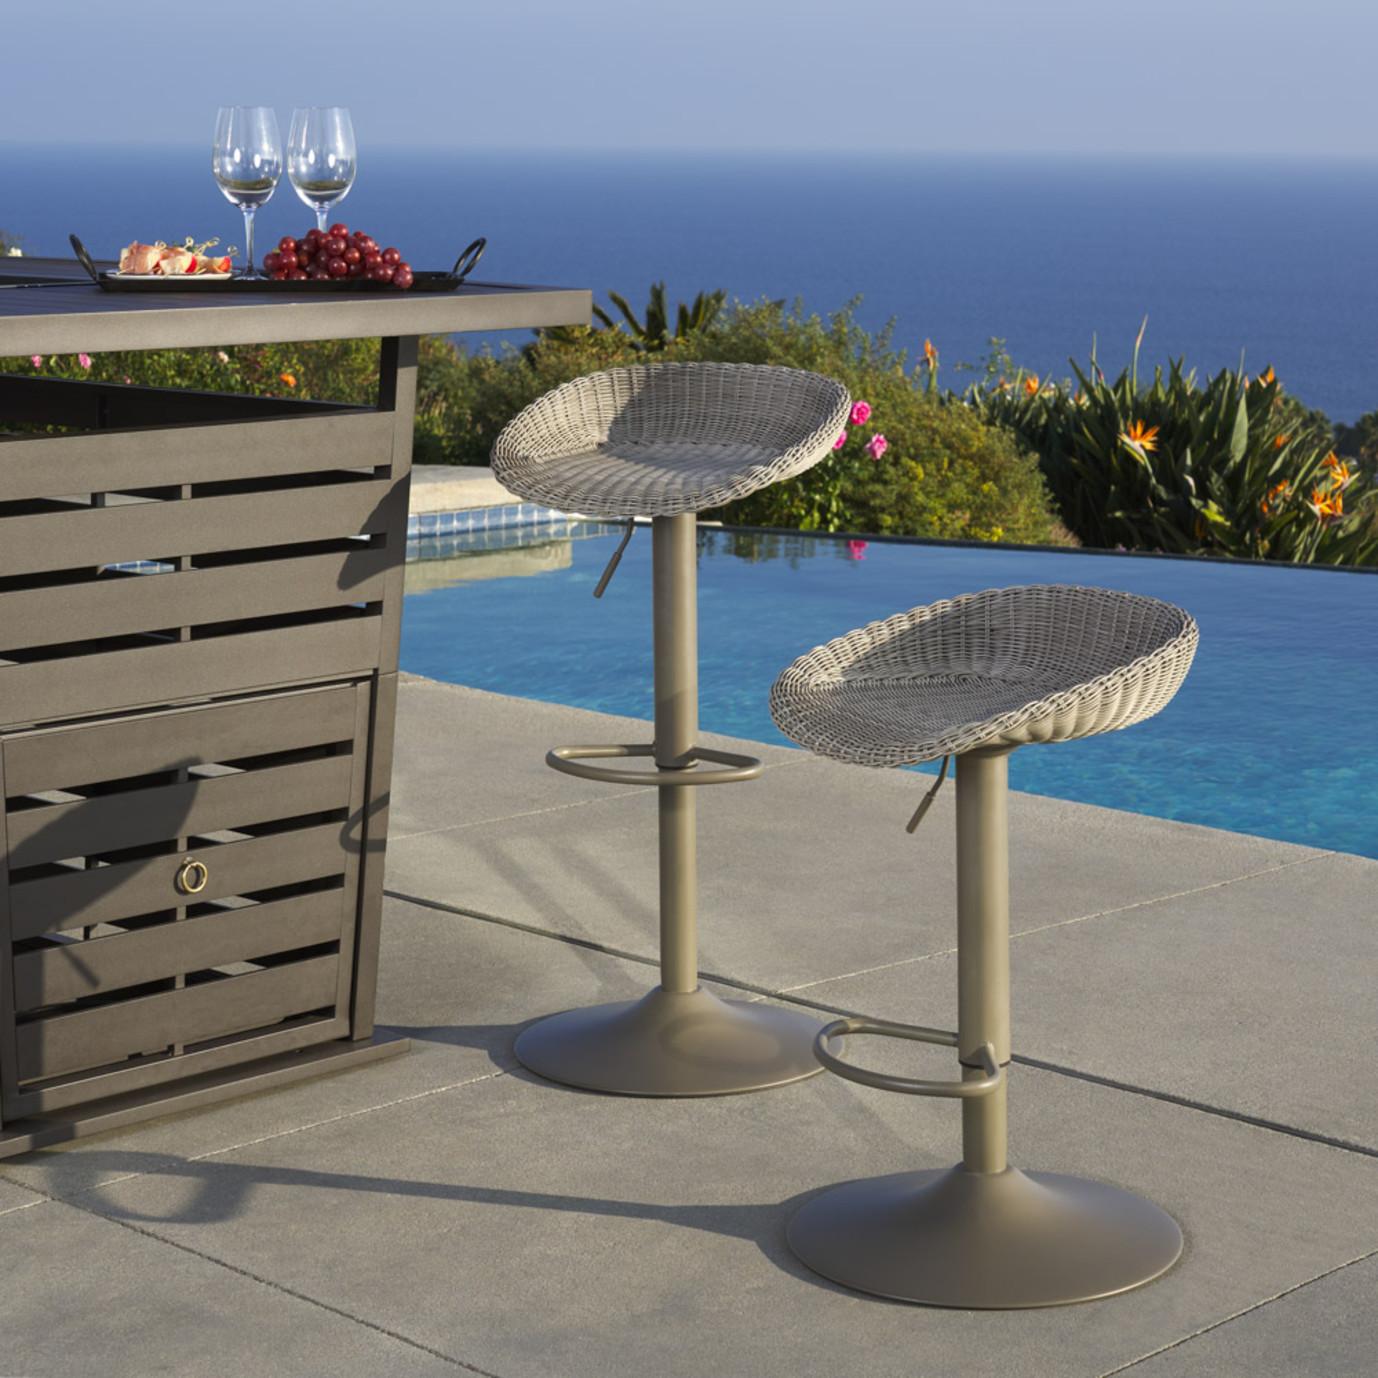 Portofino® Repose Set of 2 Airlift Barstools - Gray